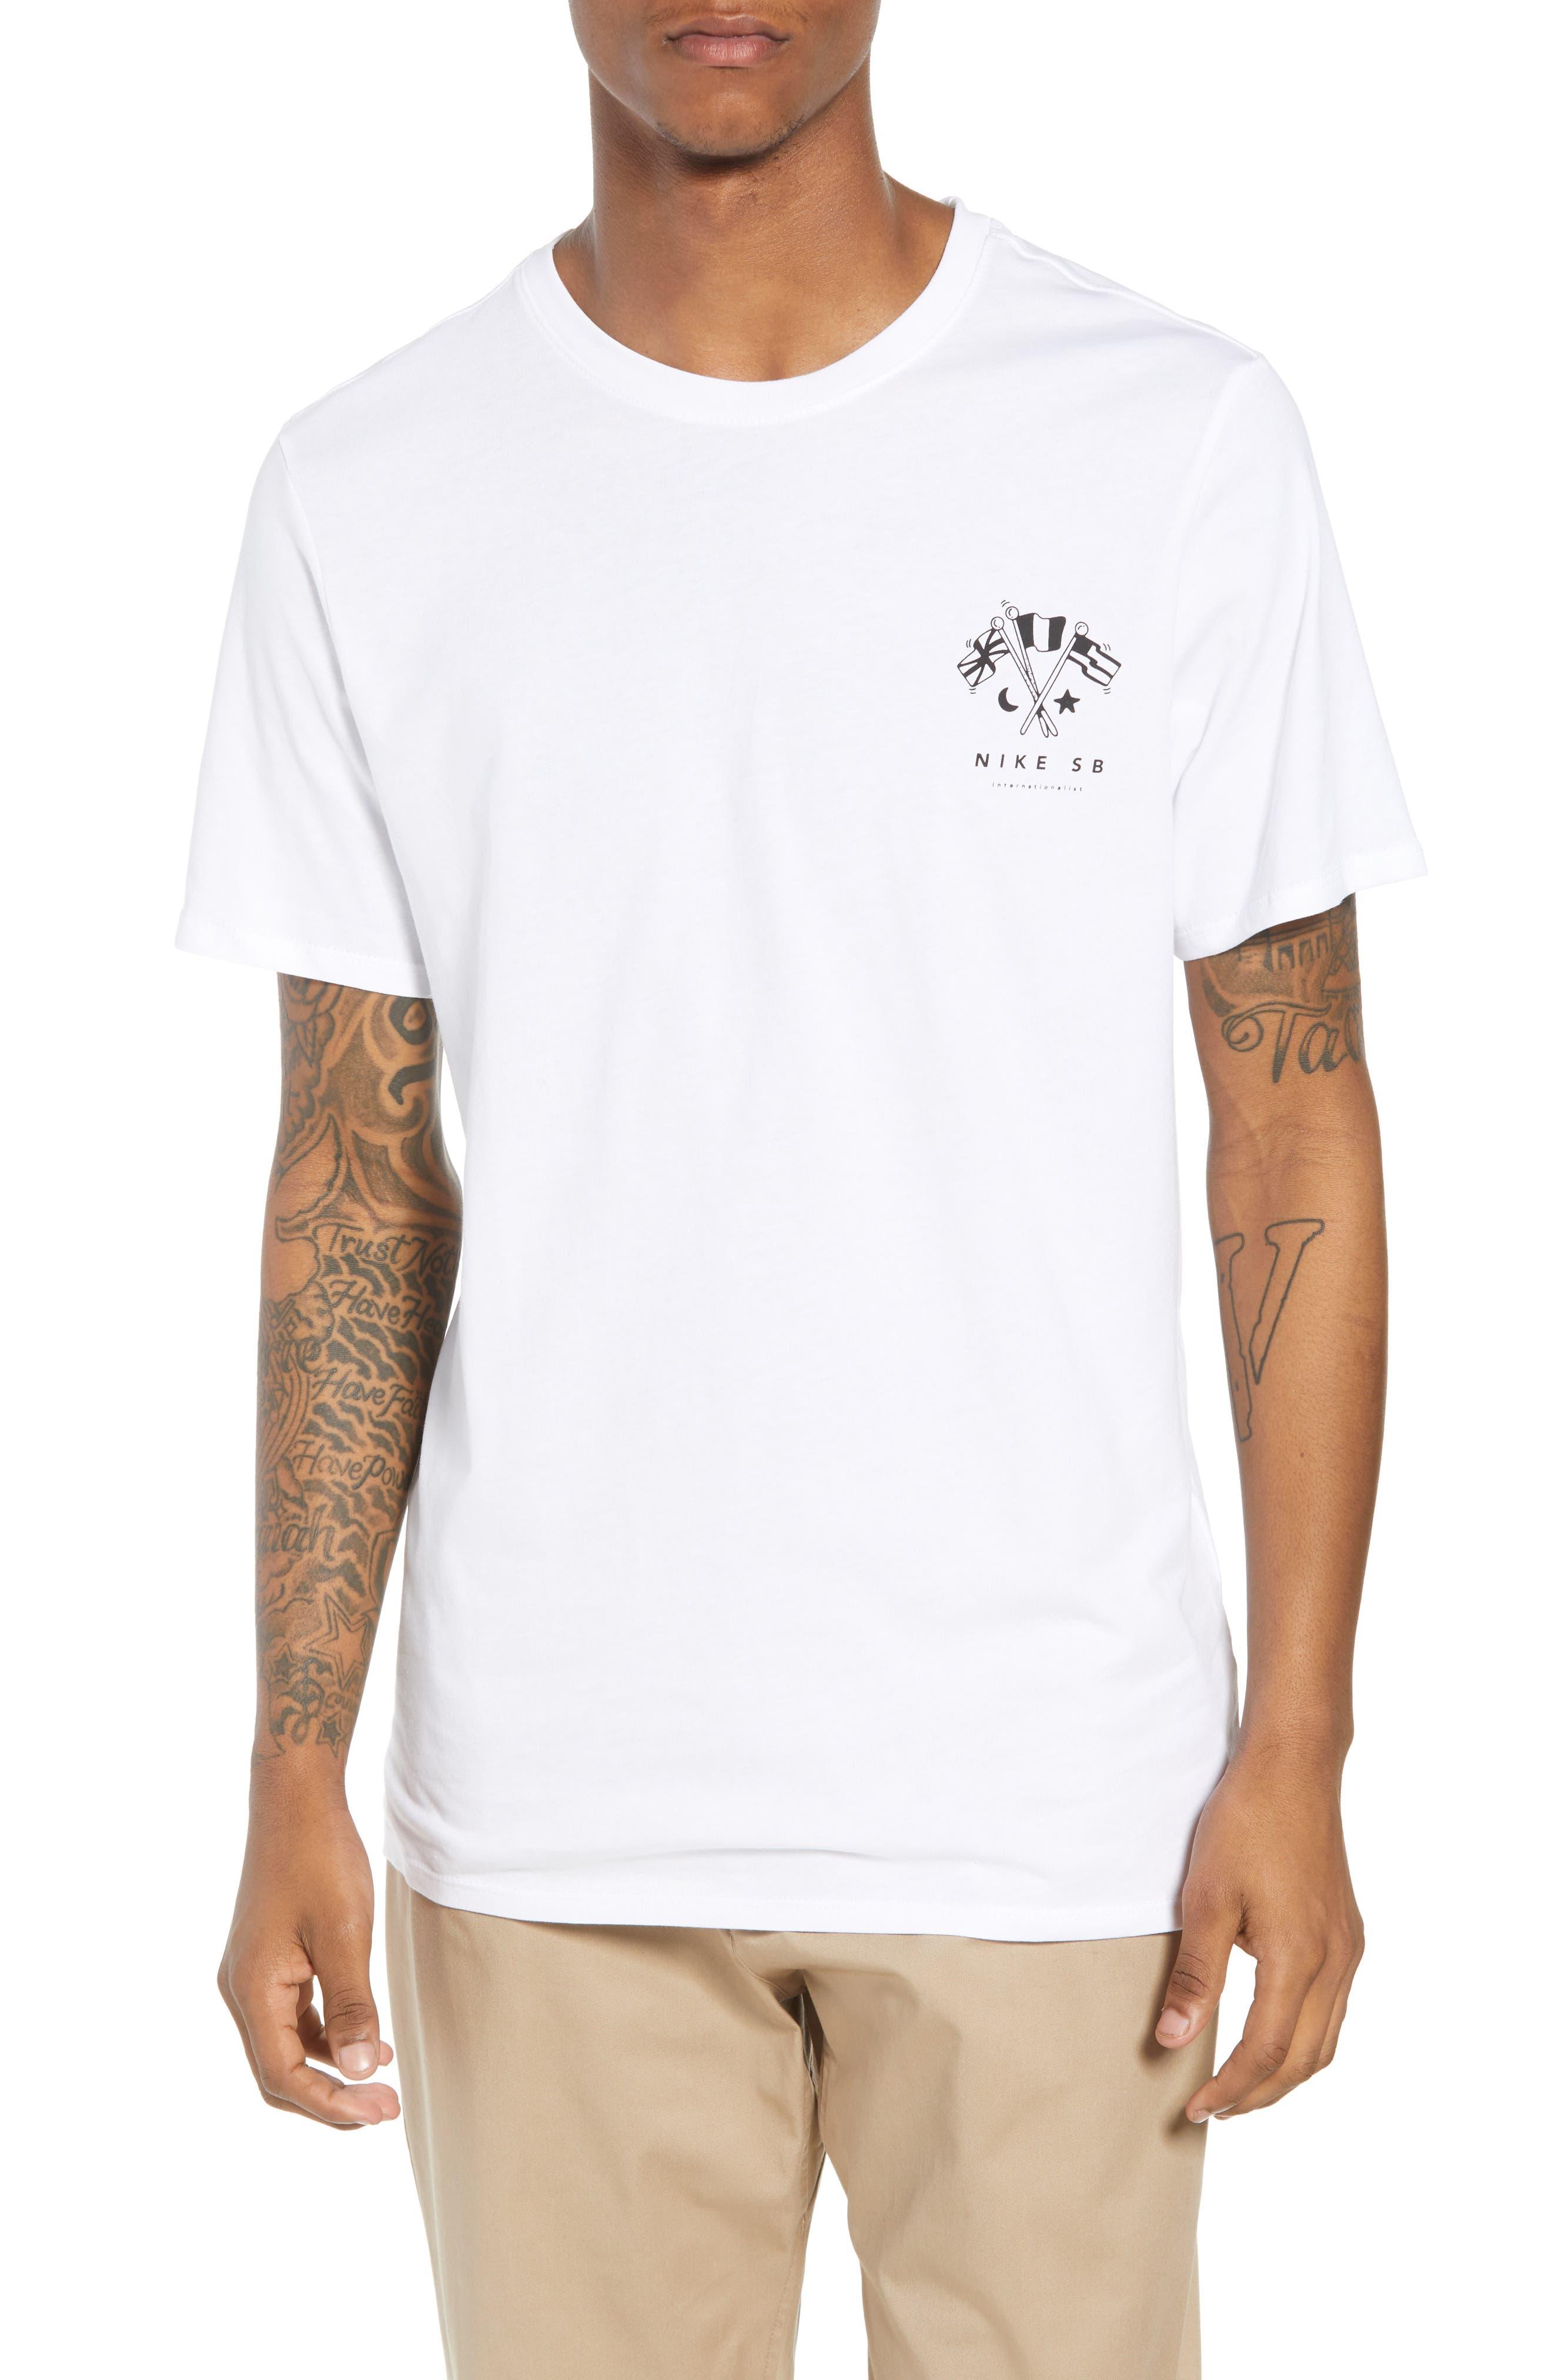 SB Monuments T-Shirt,                         Main,                         color, White/ Black